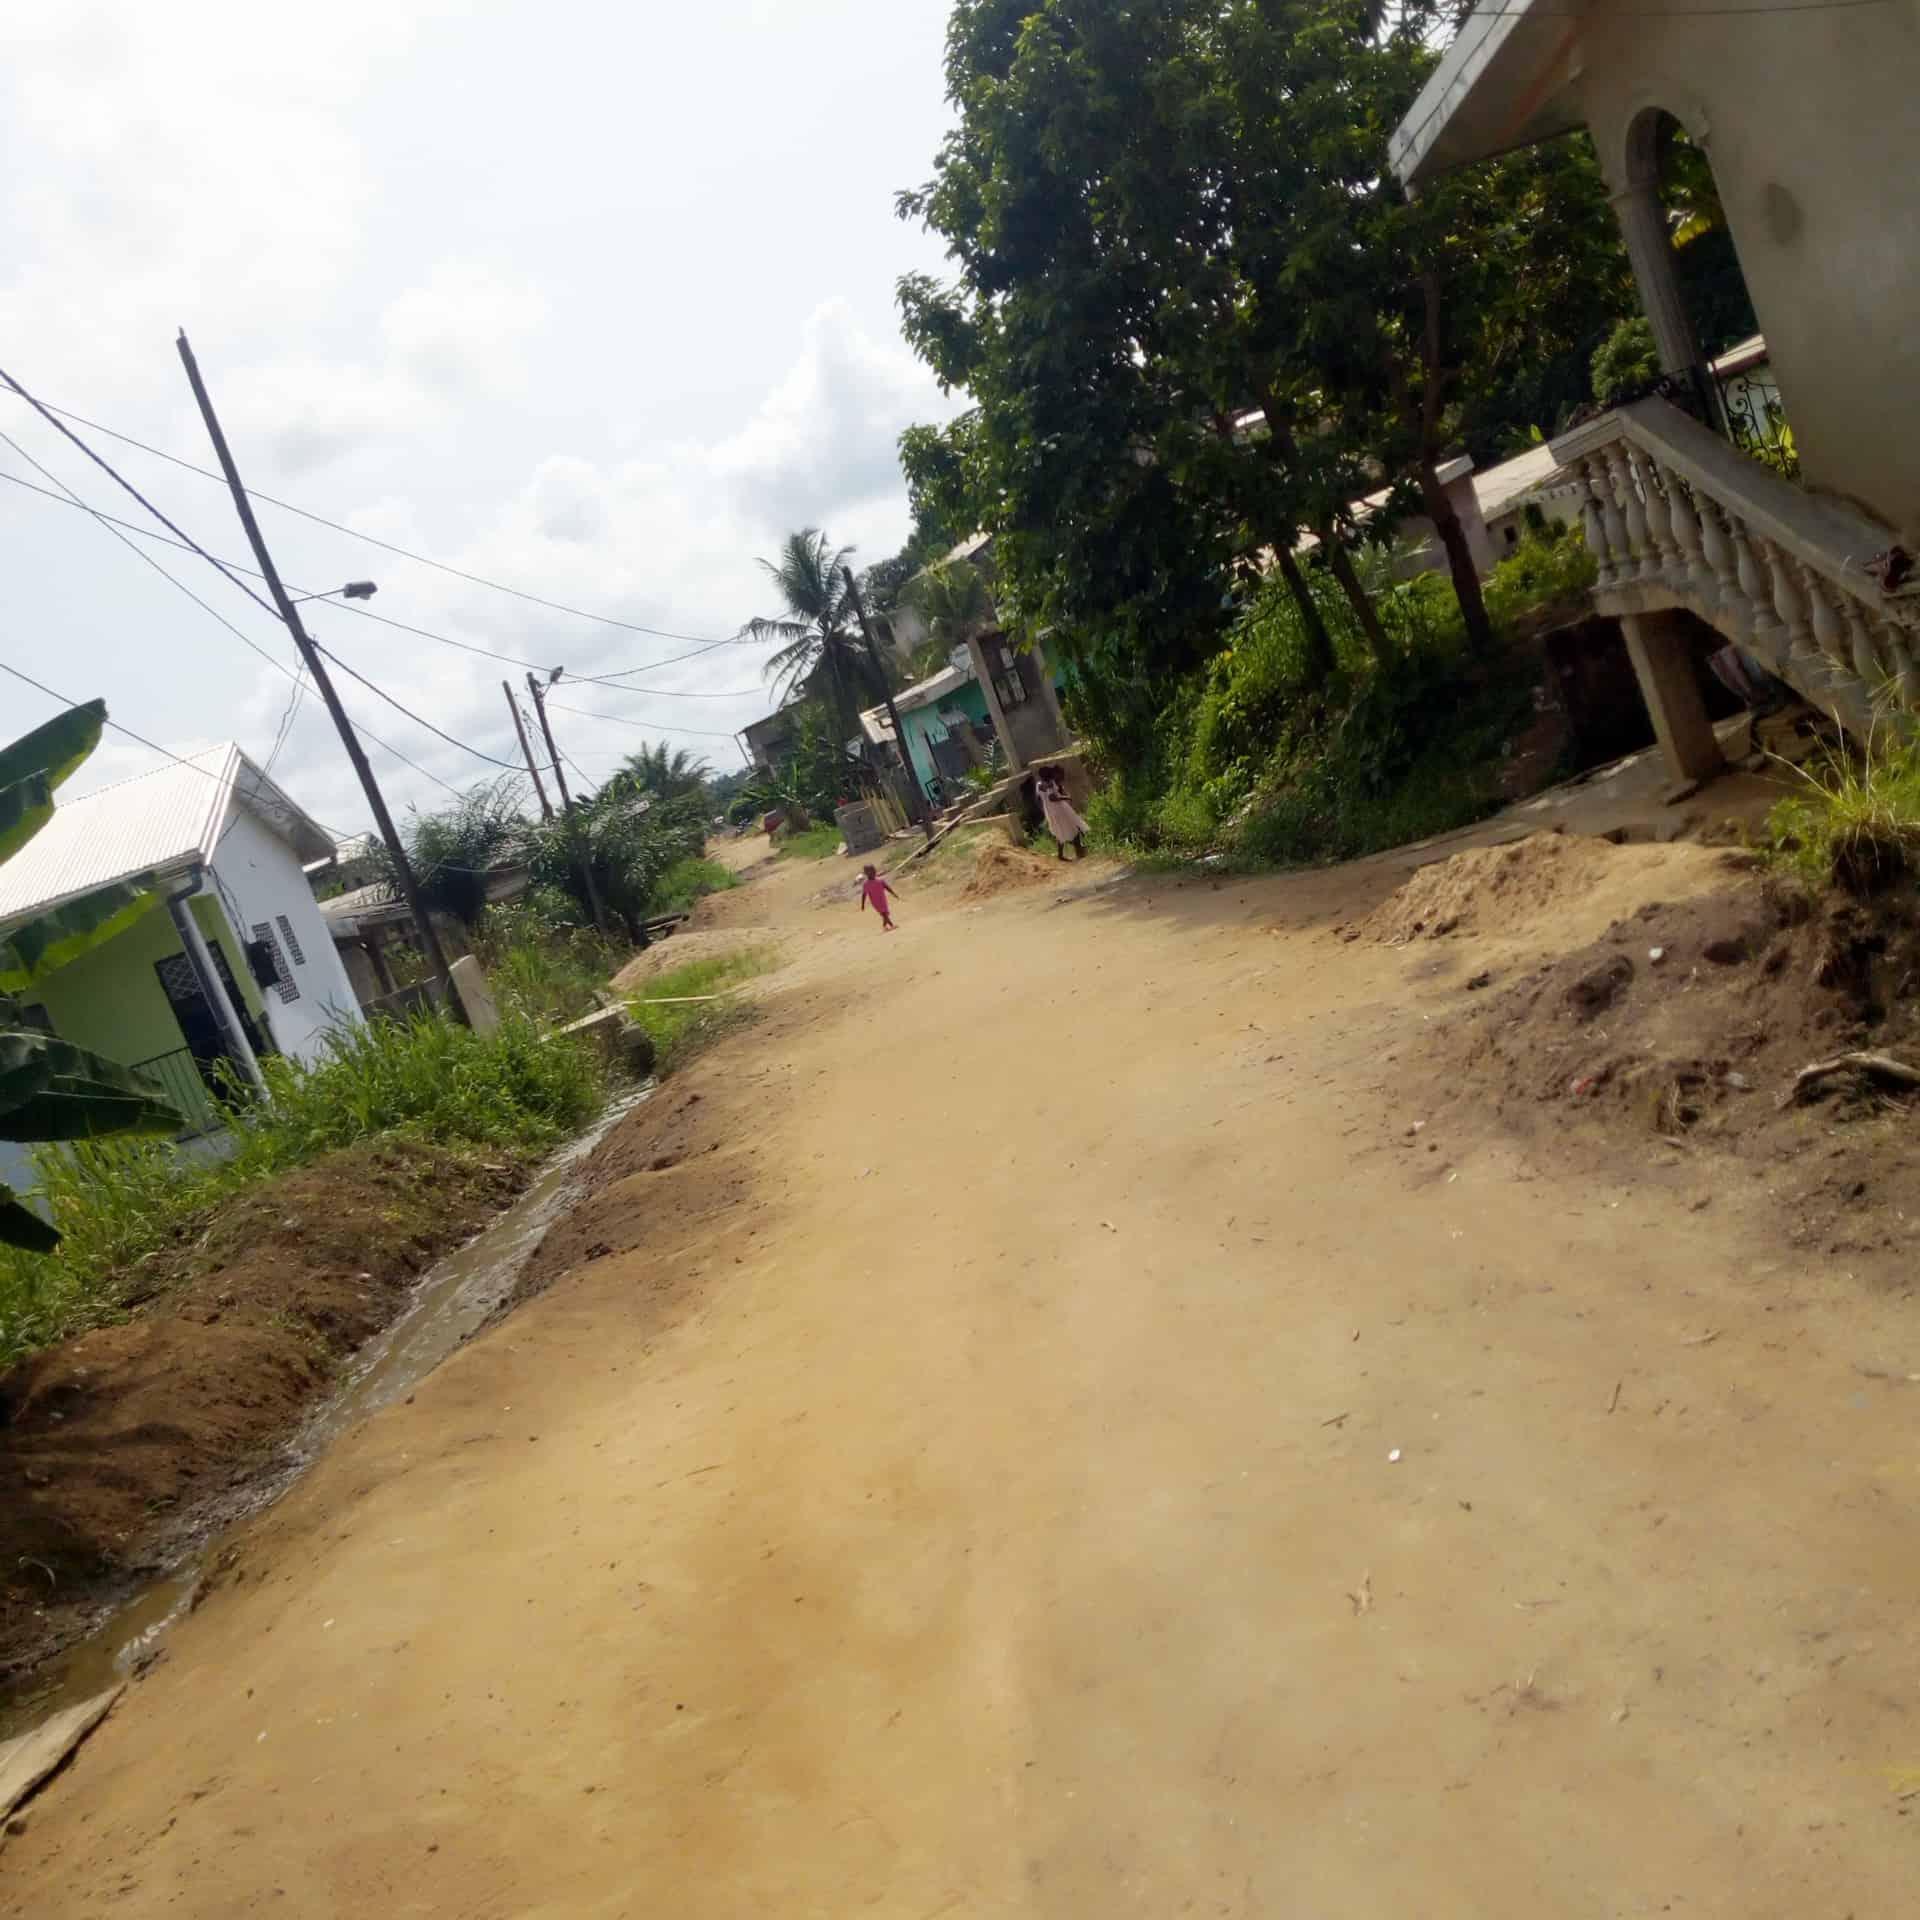 Land for sale at Douala, Bangue, Toiture rouge - 480 m2 - 3 000 000 FCFA